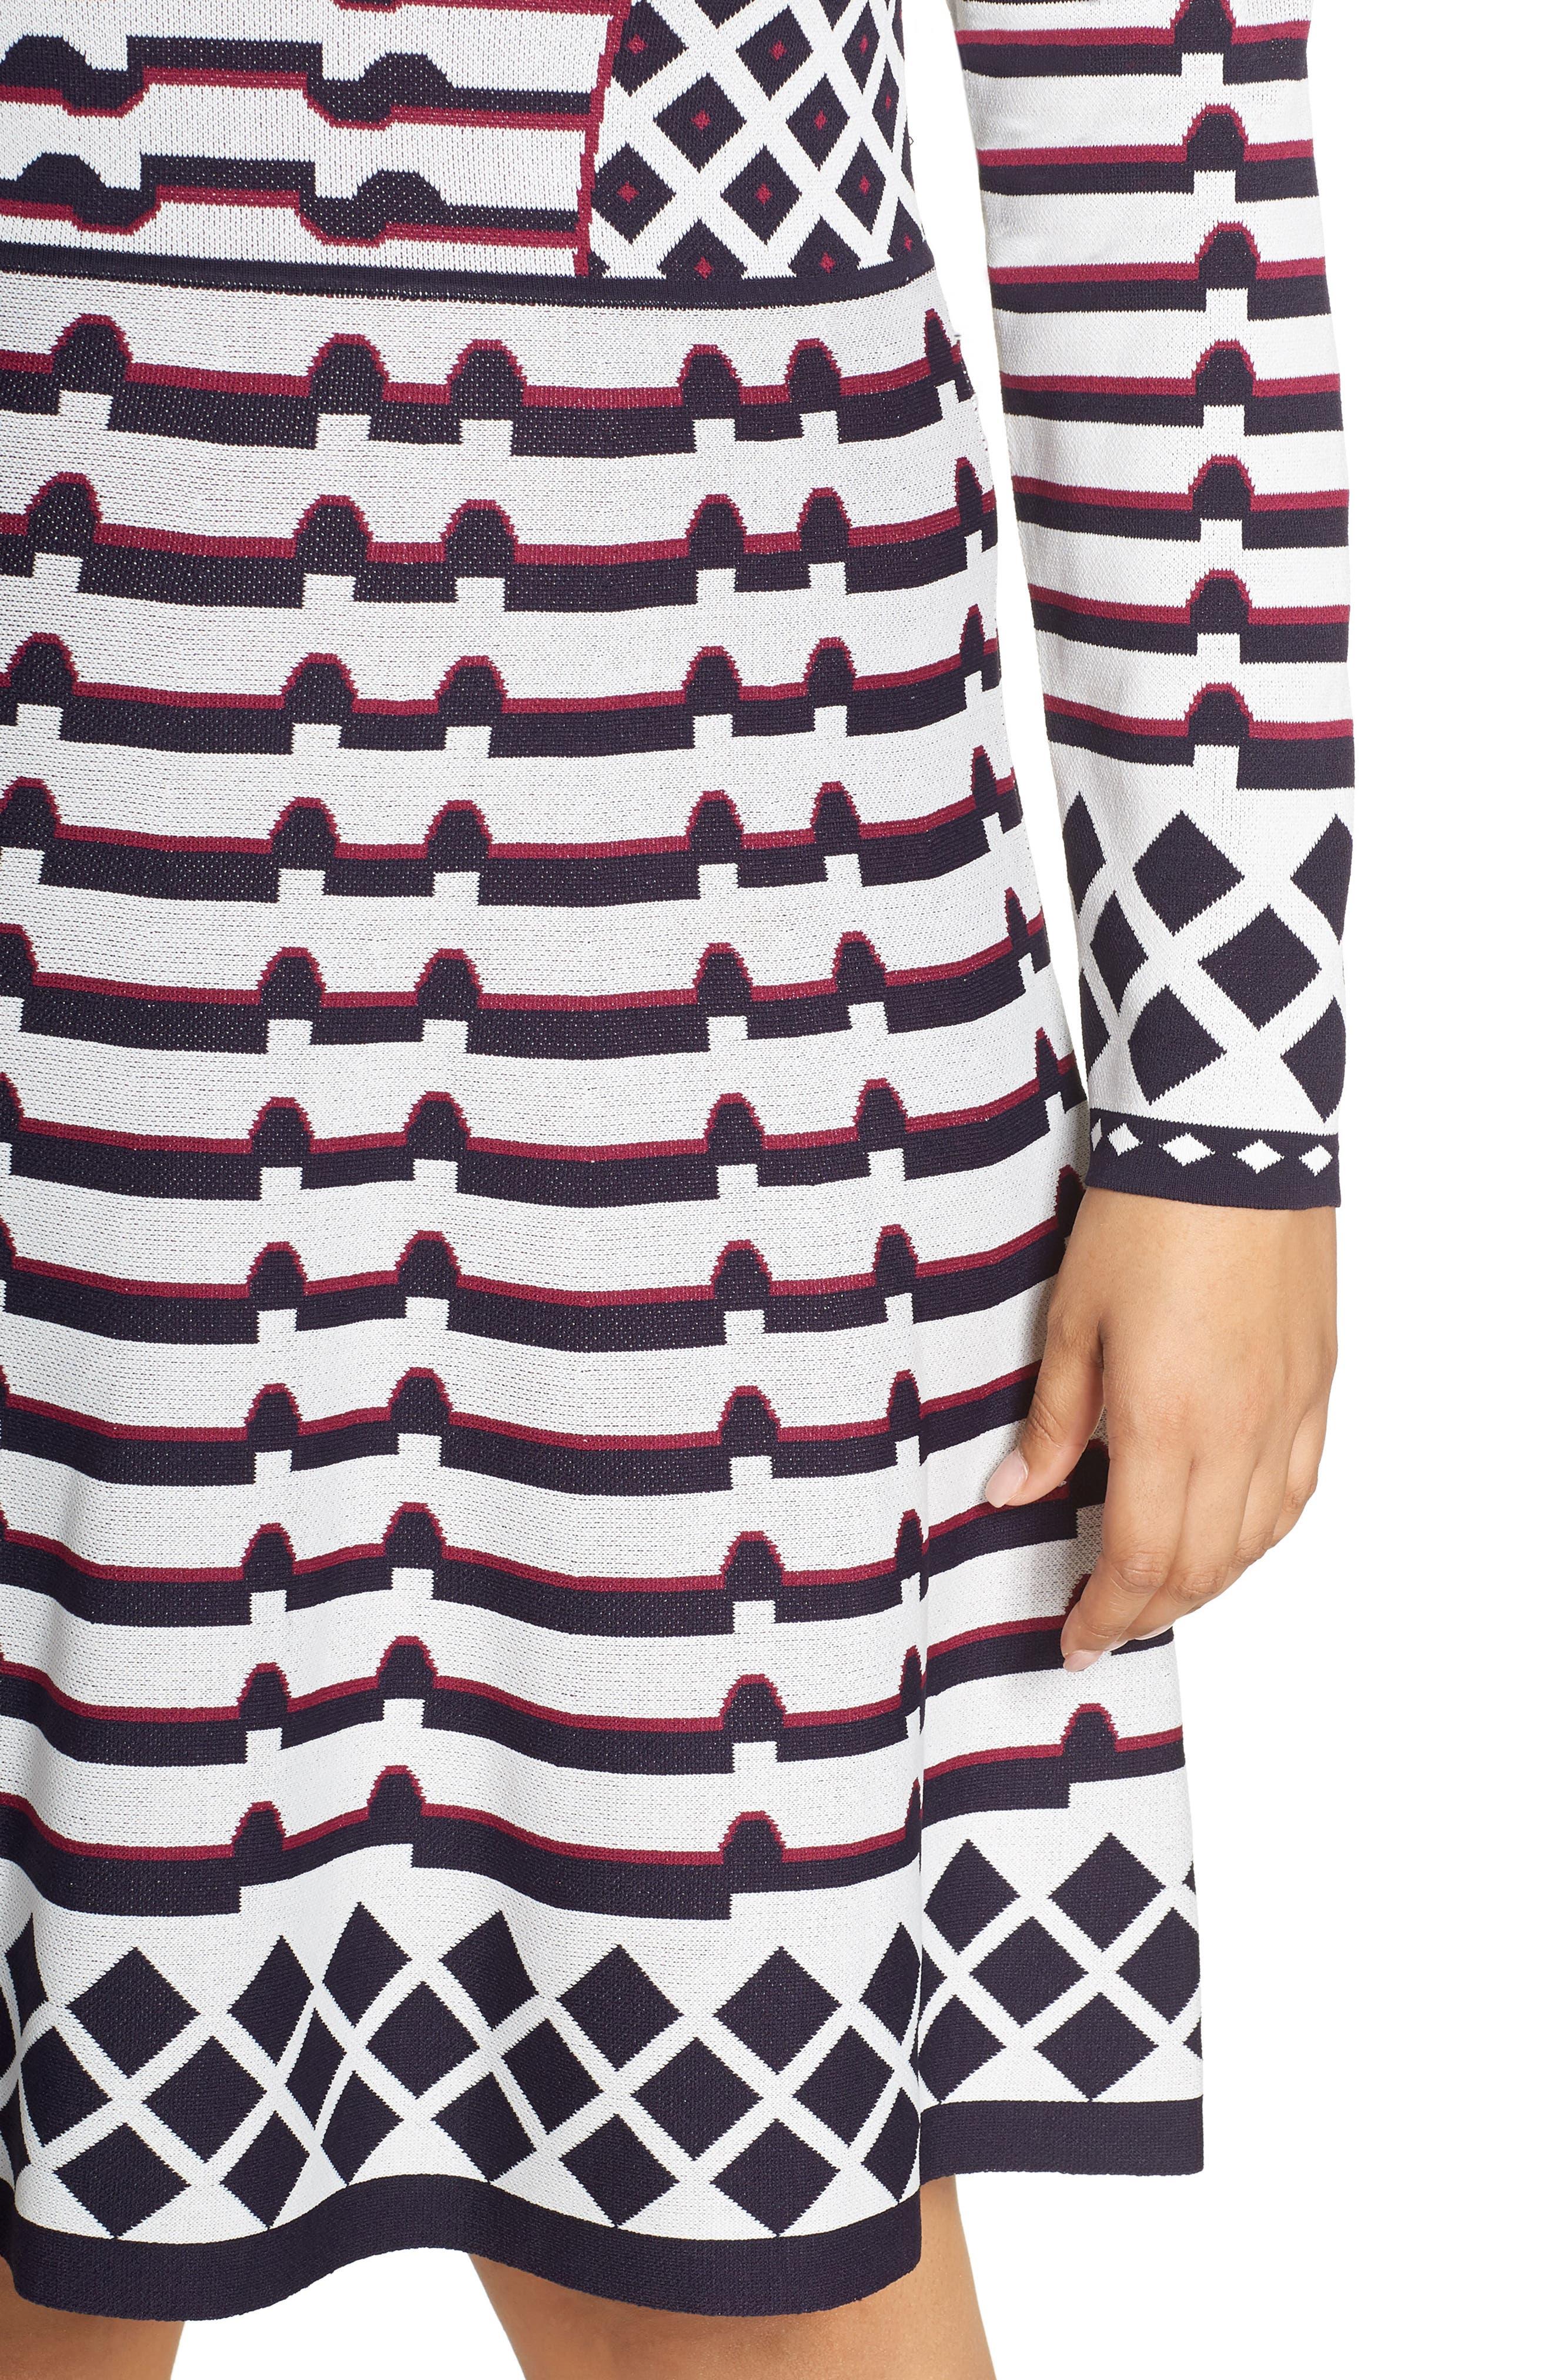 Artwork Jacquard Sweater Dress,                             Alternate thumbnail 4, color,                             NAVY